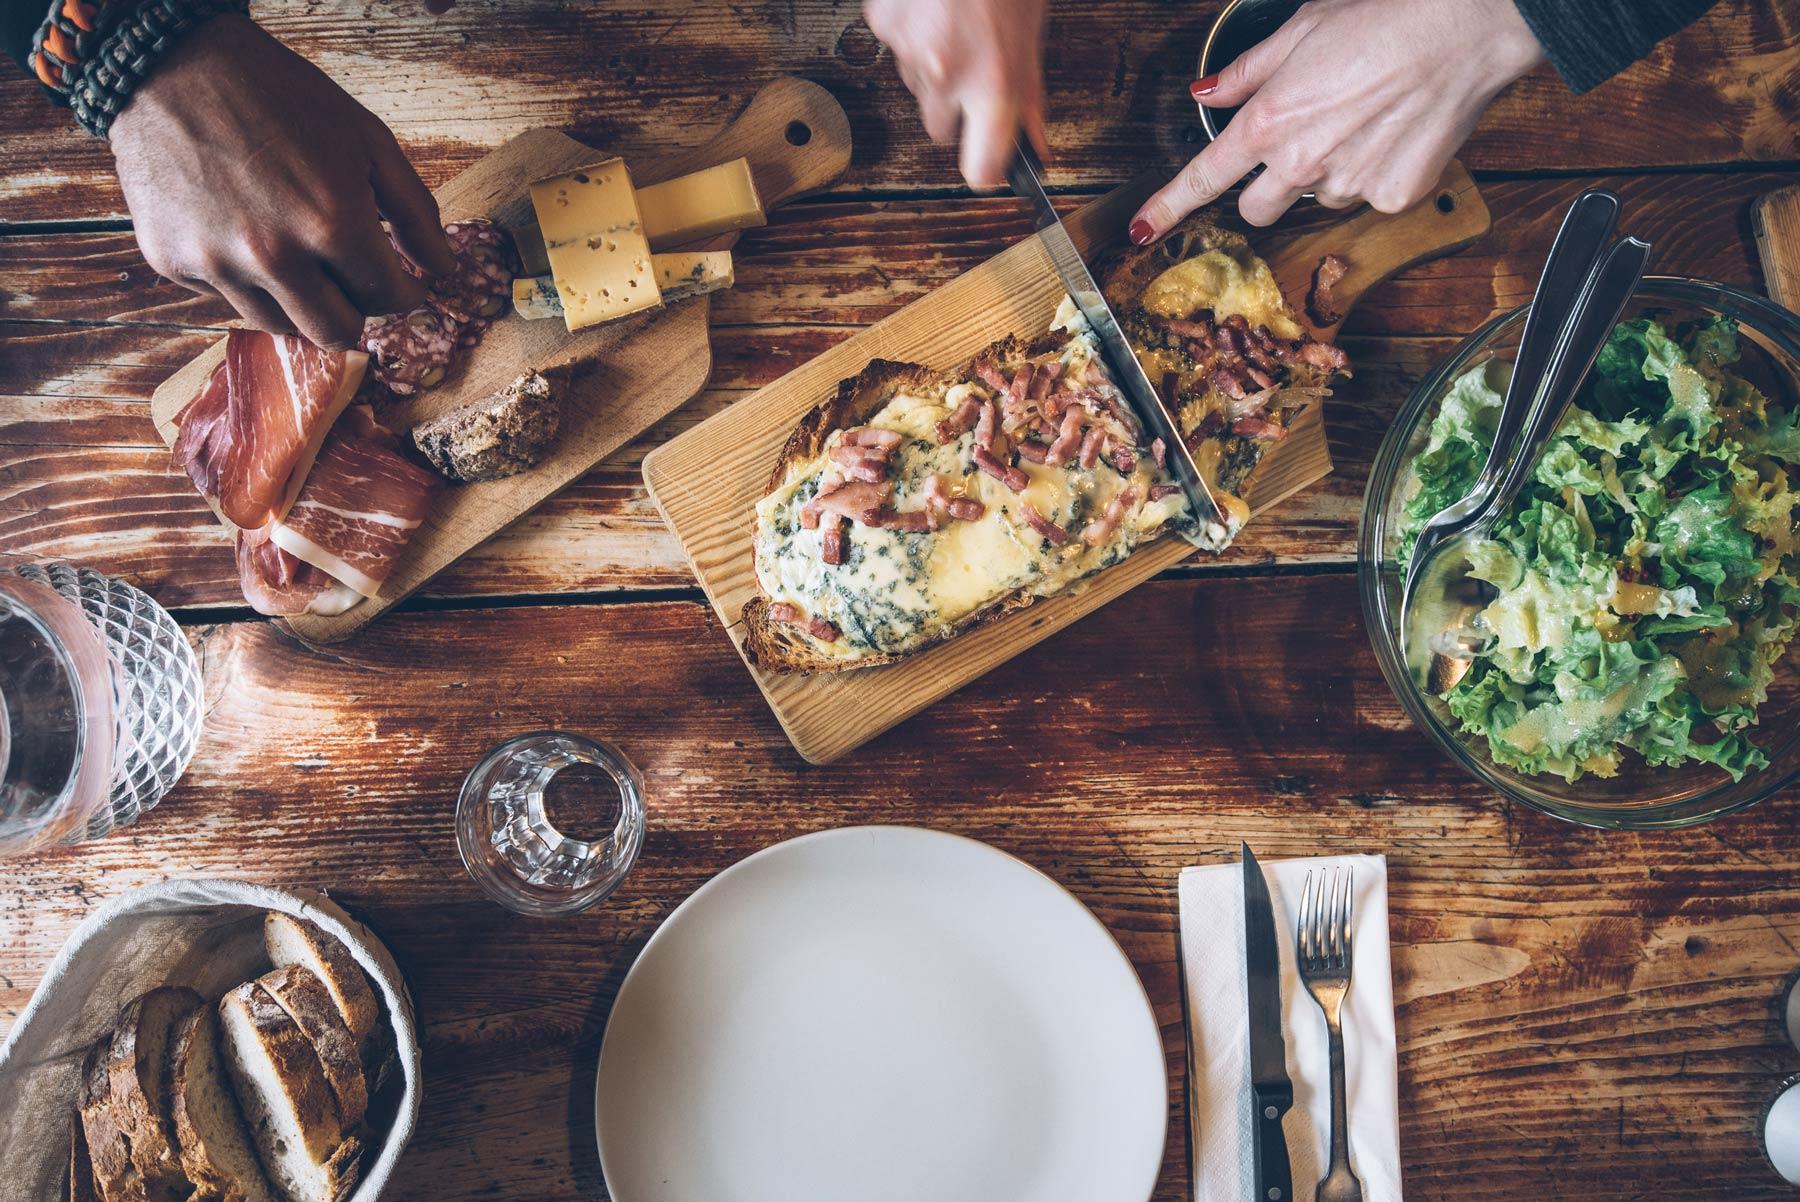 Ou manger dans le Jura: Refuge du Berbois à la Pesse